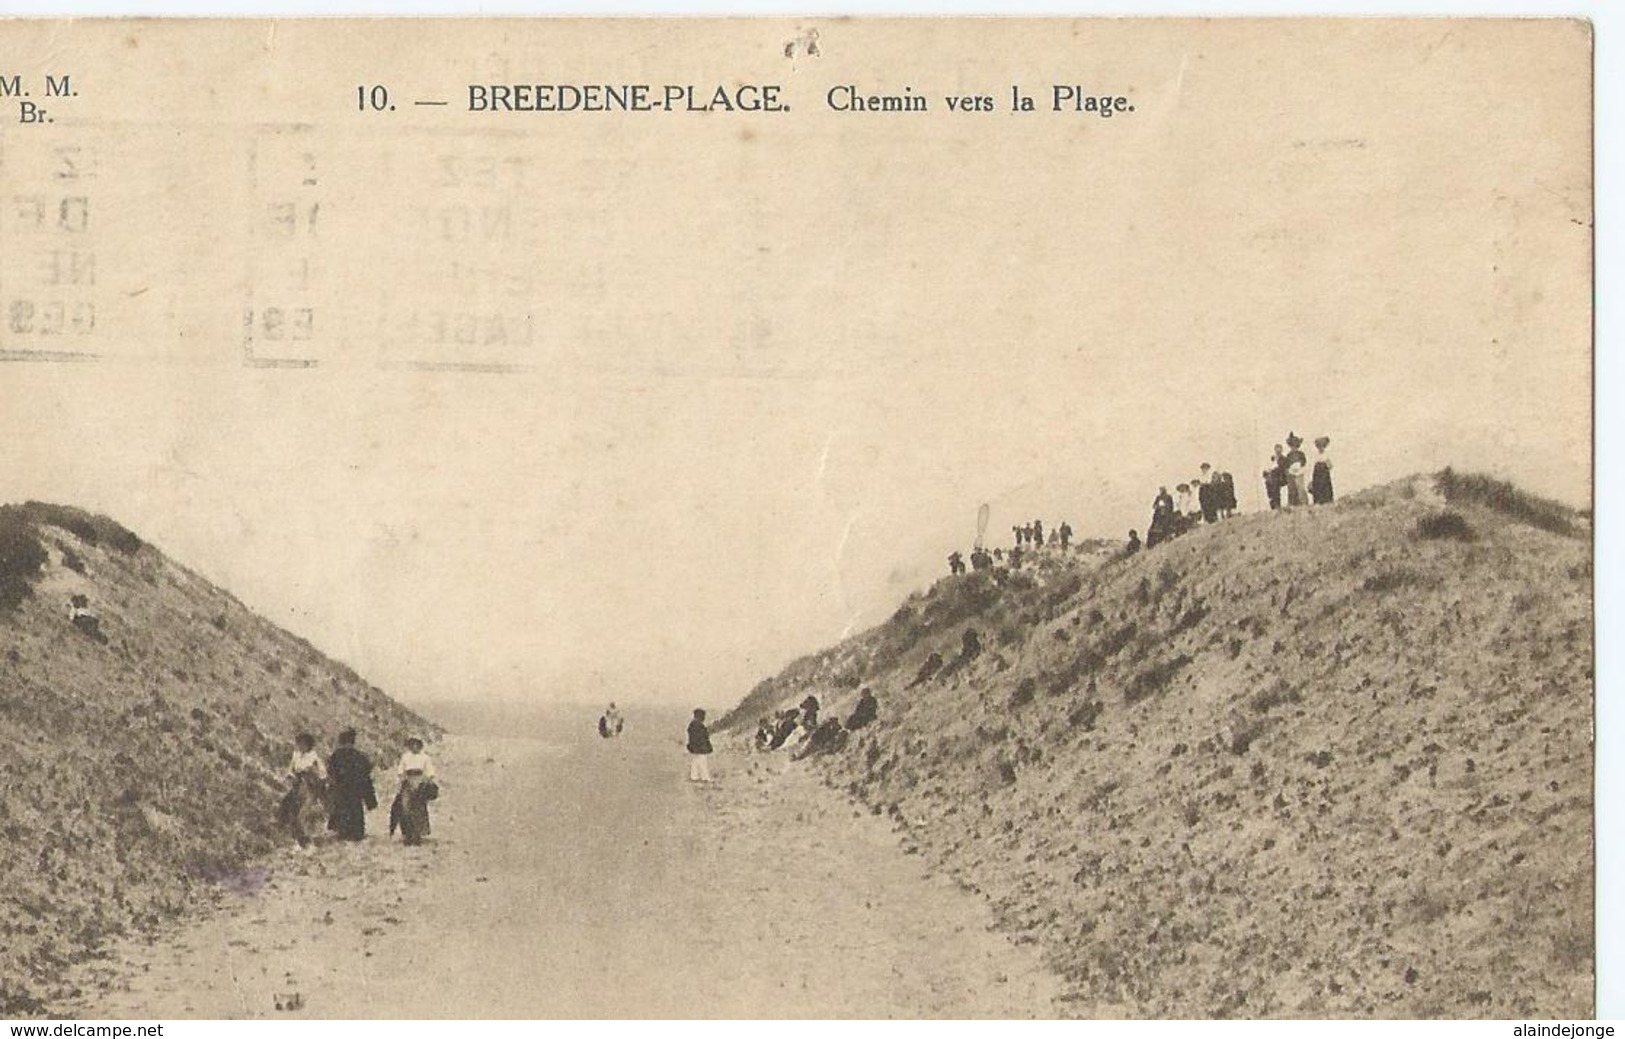 Bredene A/Zee - Bredene S/Mer - Breedene-Plage - Chemin Vers La Plage - M.M. Br. 10 - 1938 - Bredene